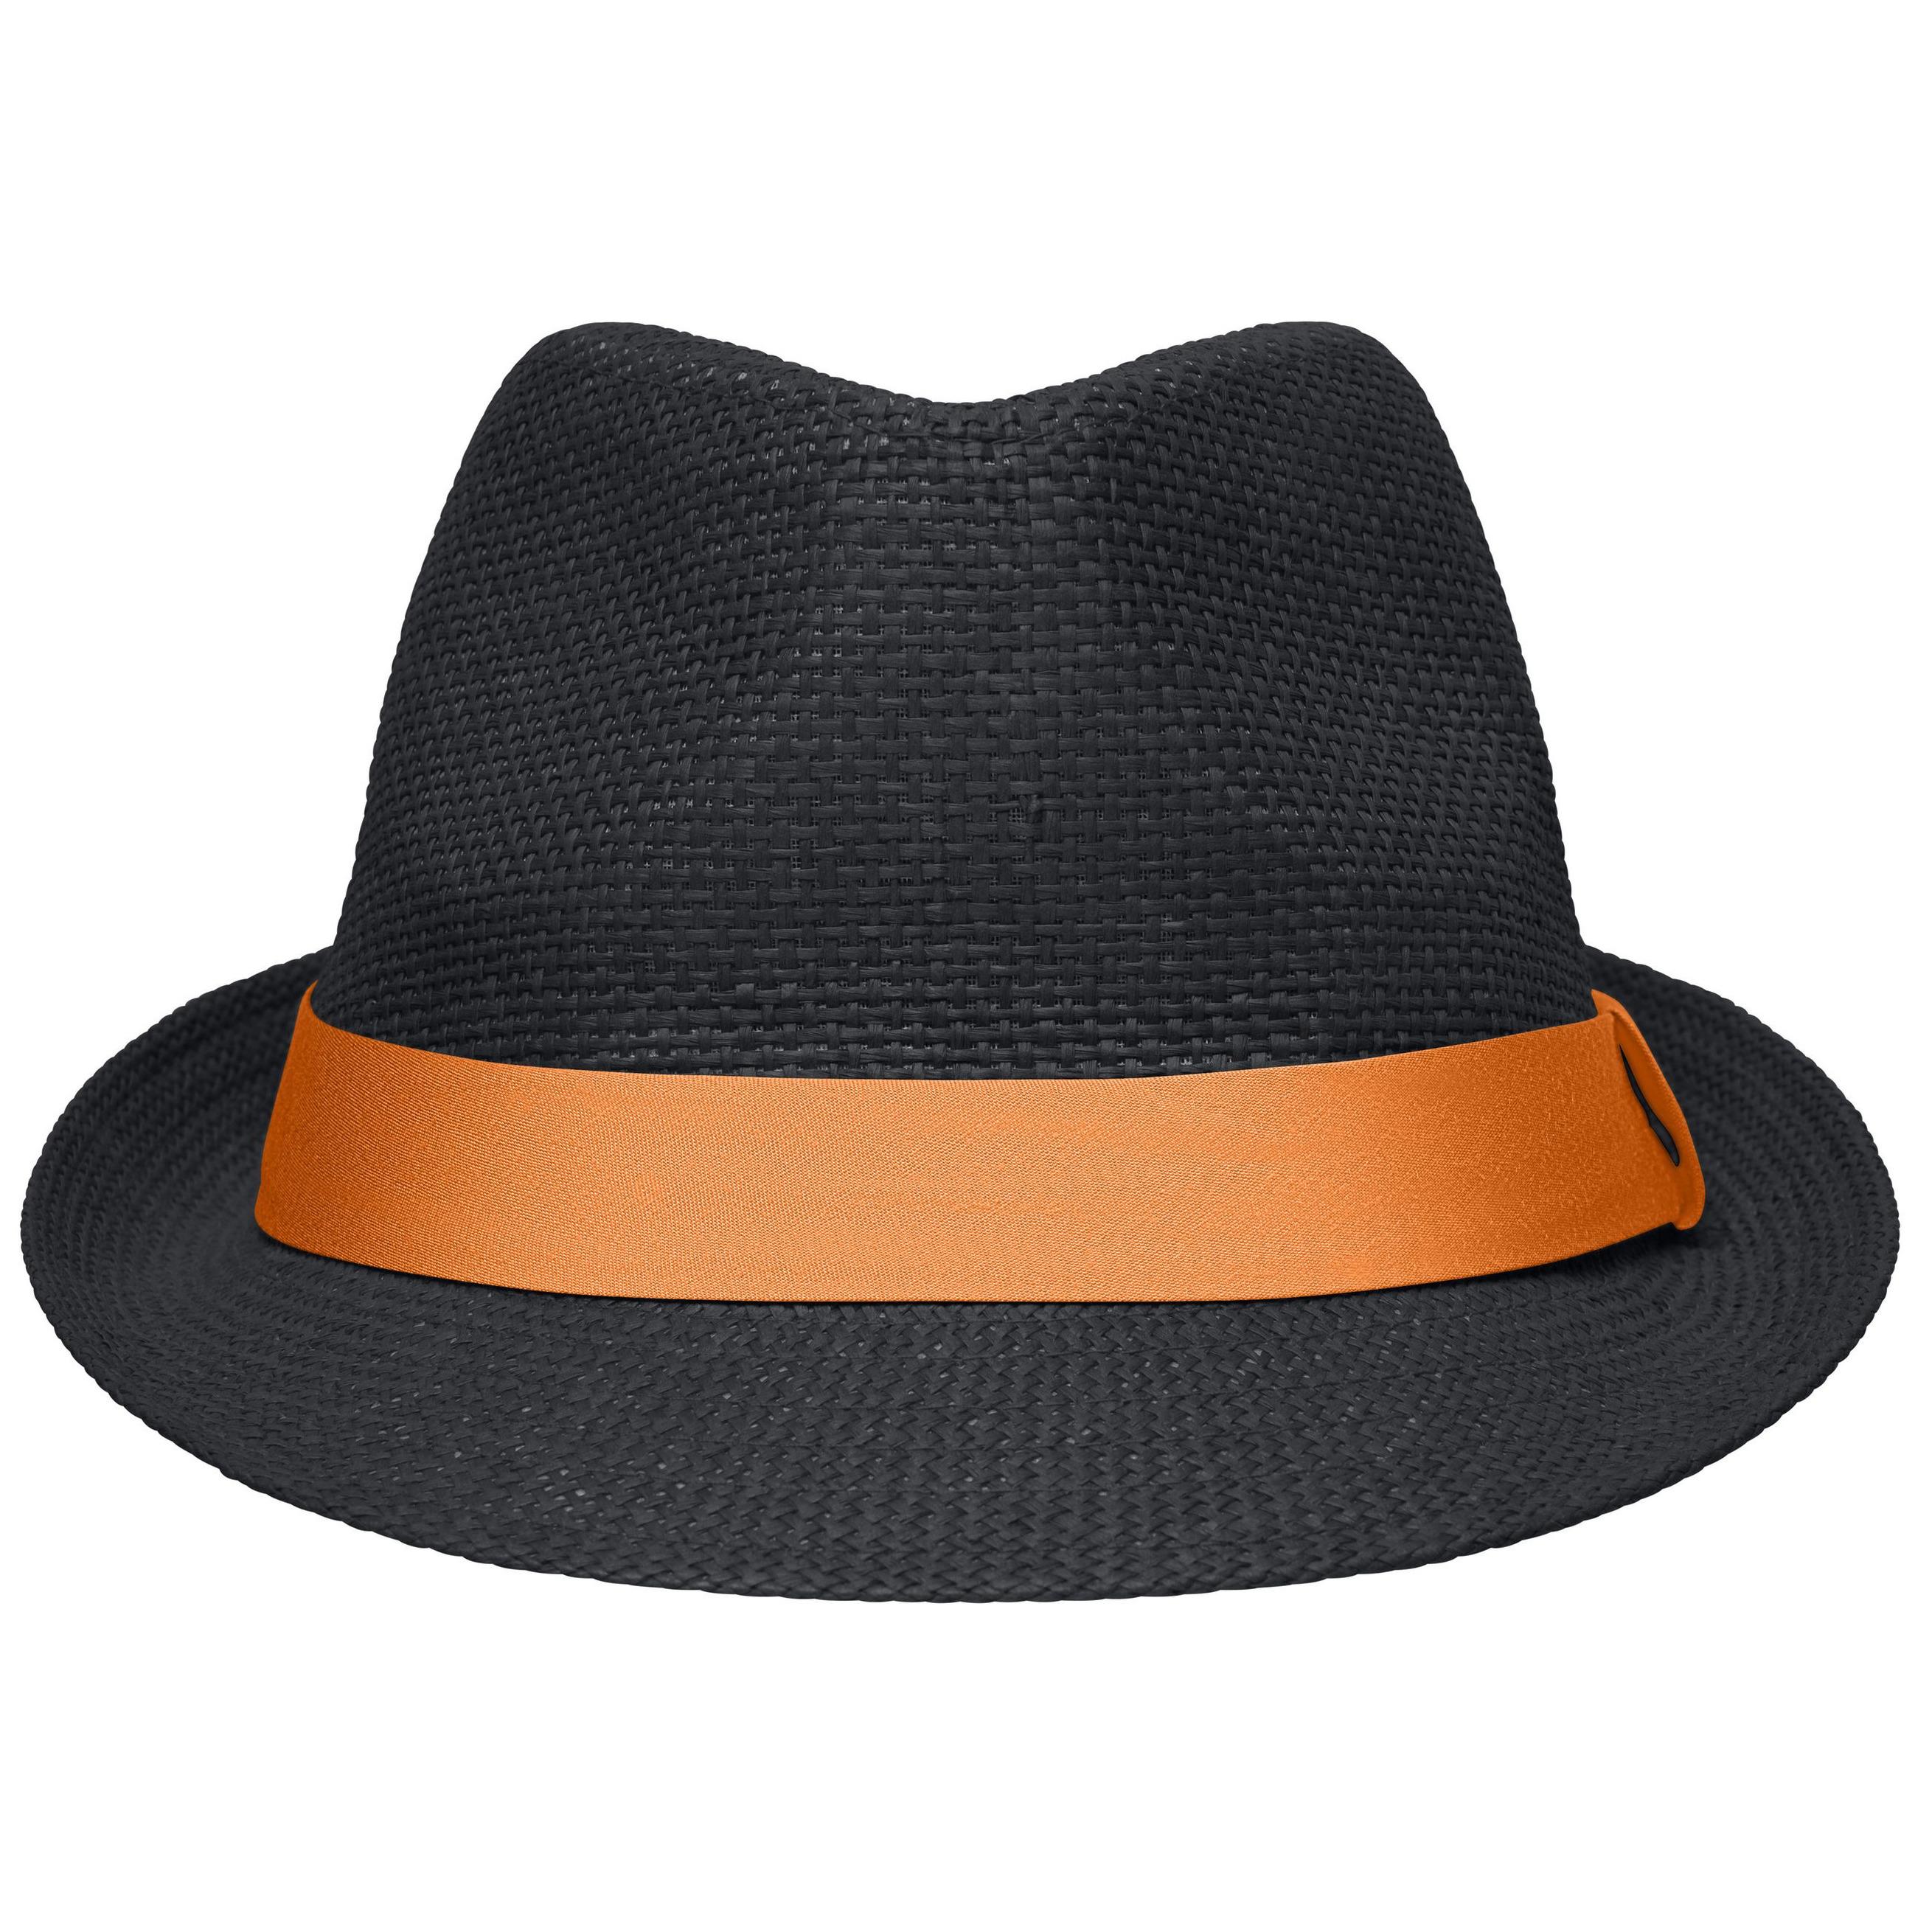 Zwart met oranje trilby hoedje